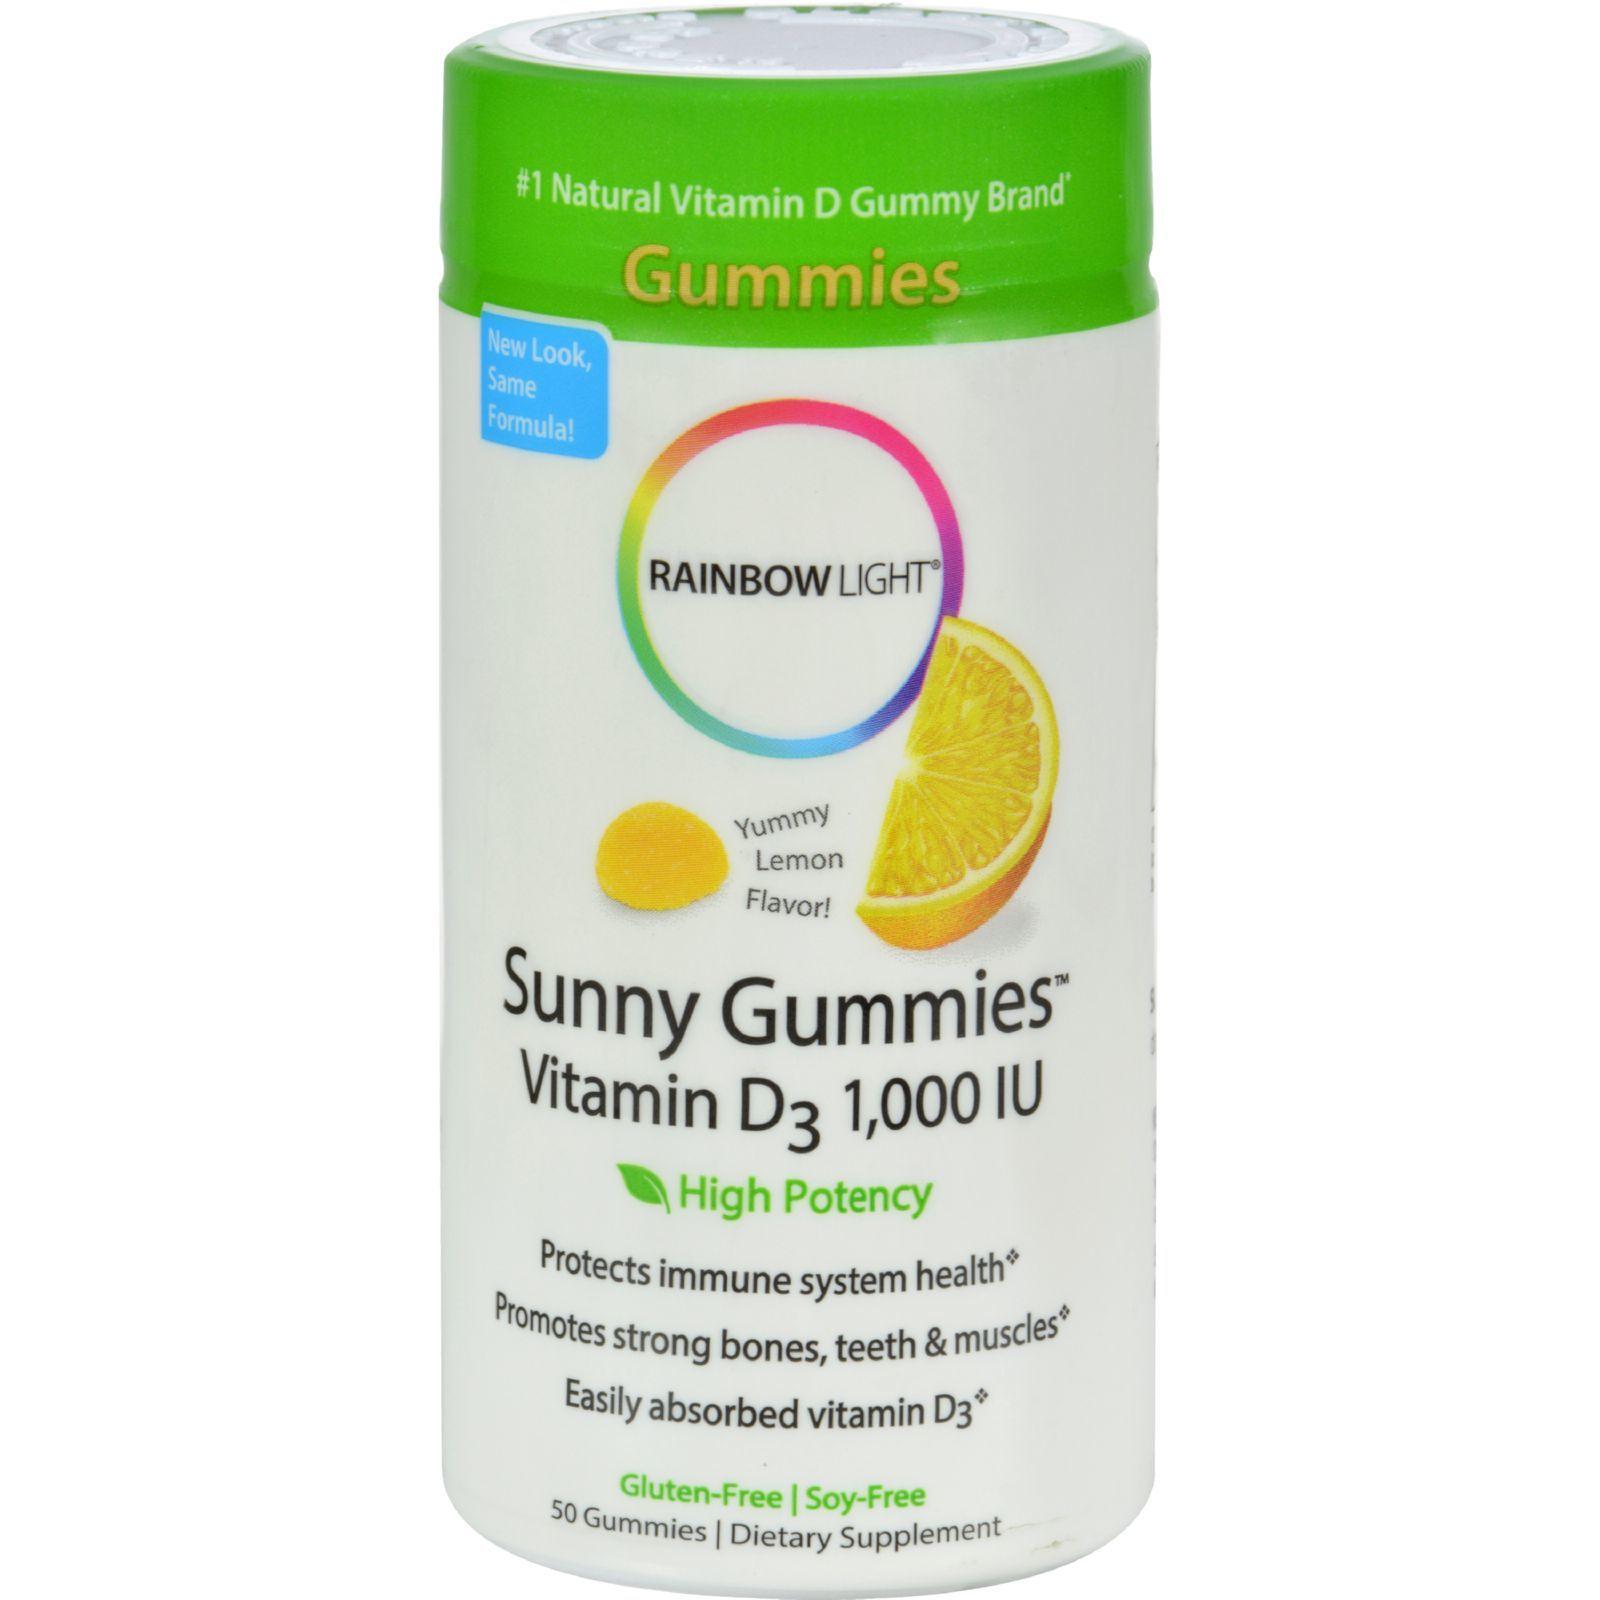 Rainbow Light Vitamin D Sunny Gummies Sour Lemon - 1000 IU - 50 Gummies